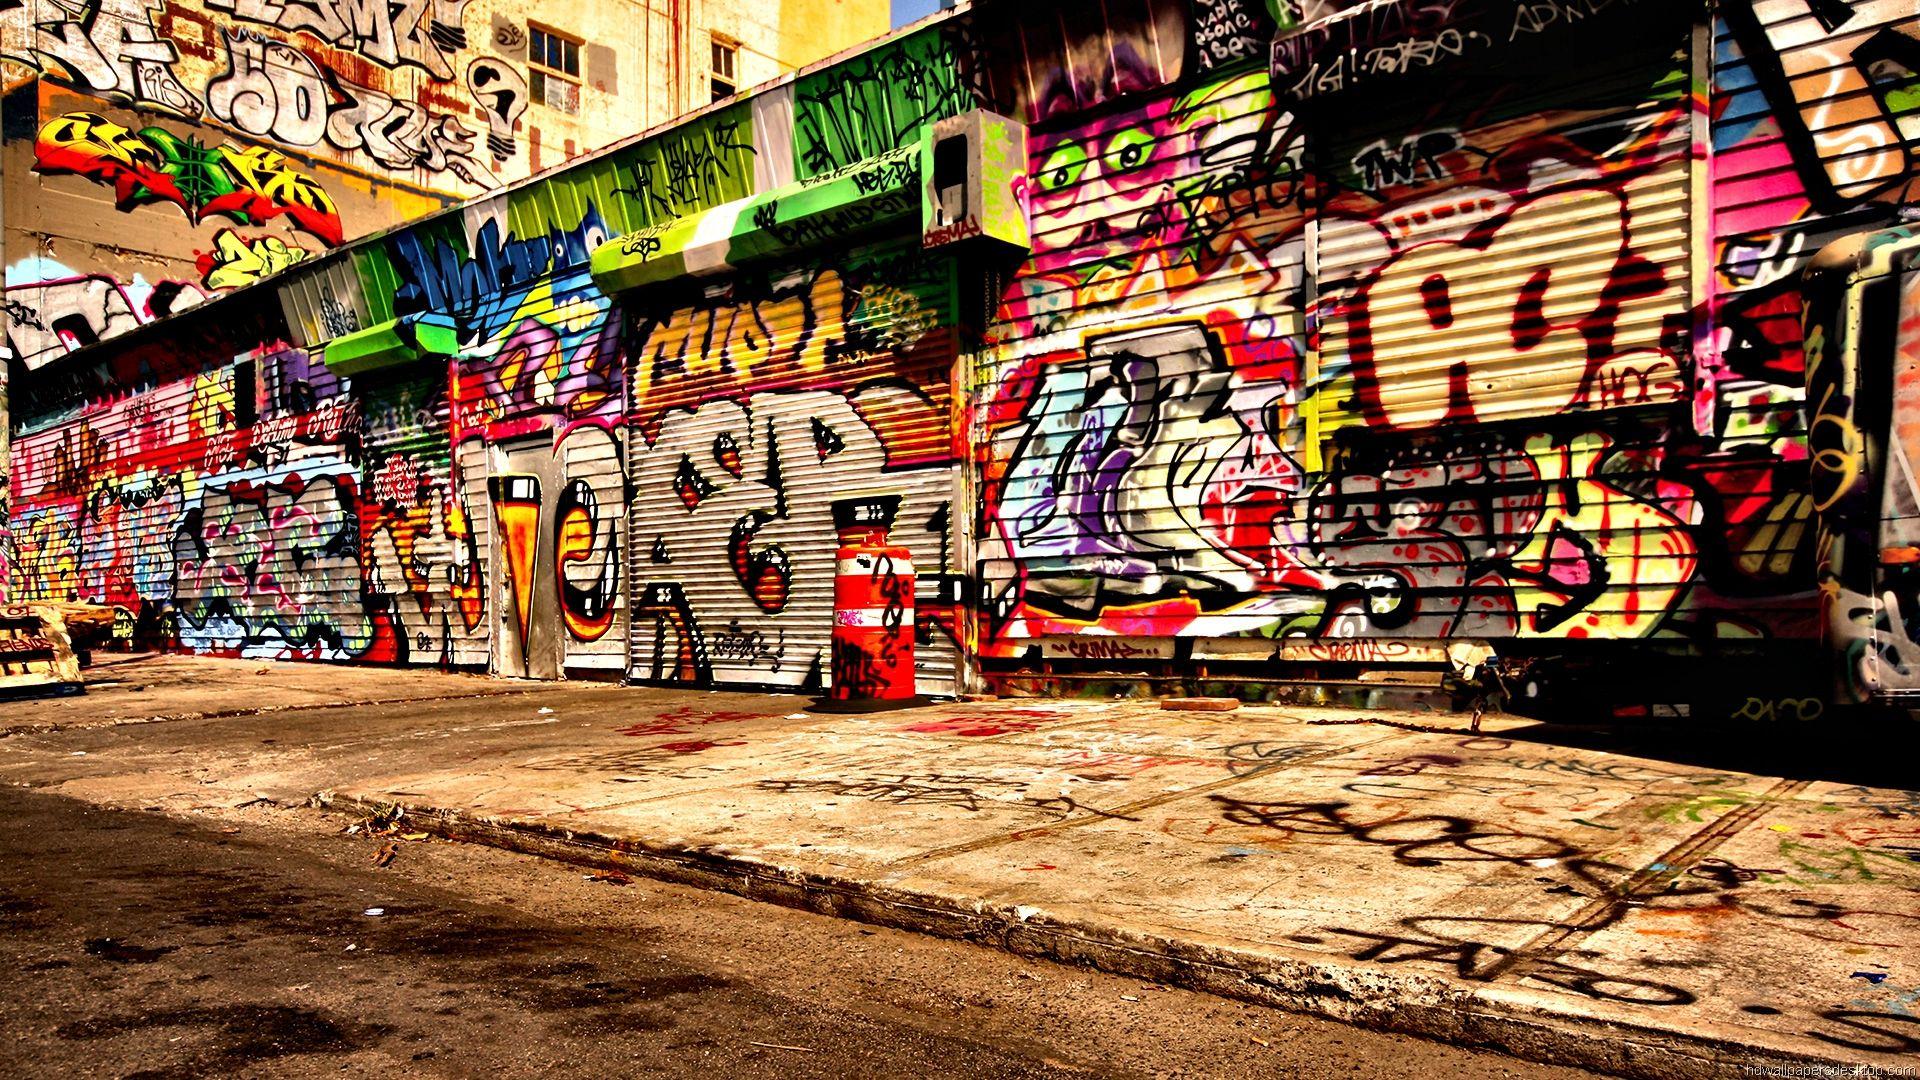 500 Internal Server Error Graffiti Photography Graffiti Wallpaper Street Art